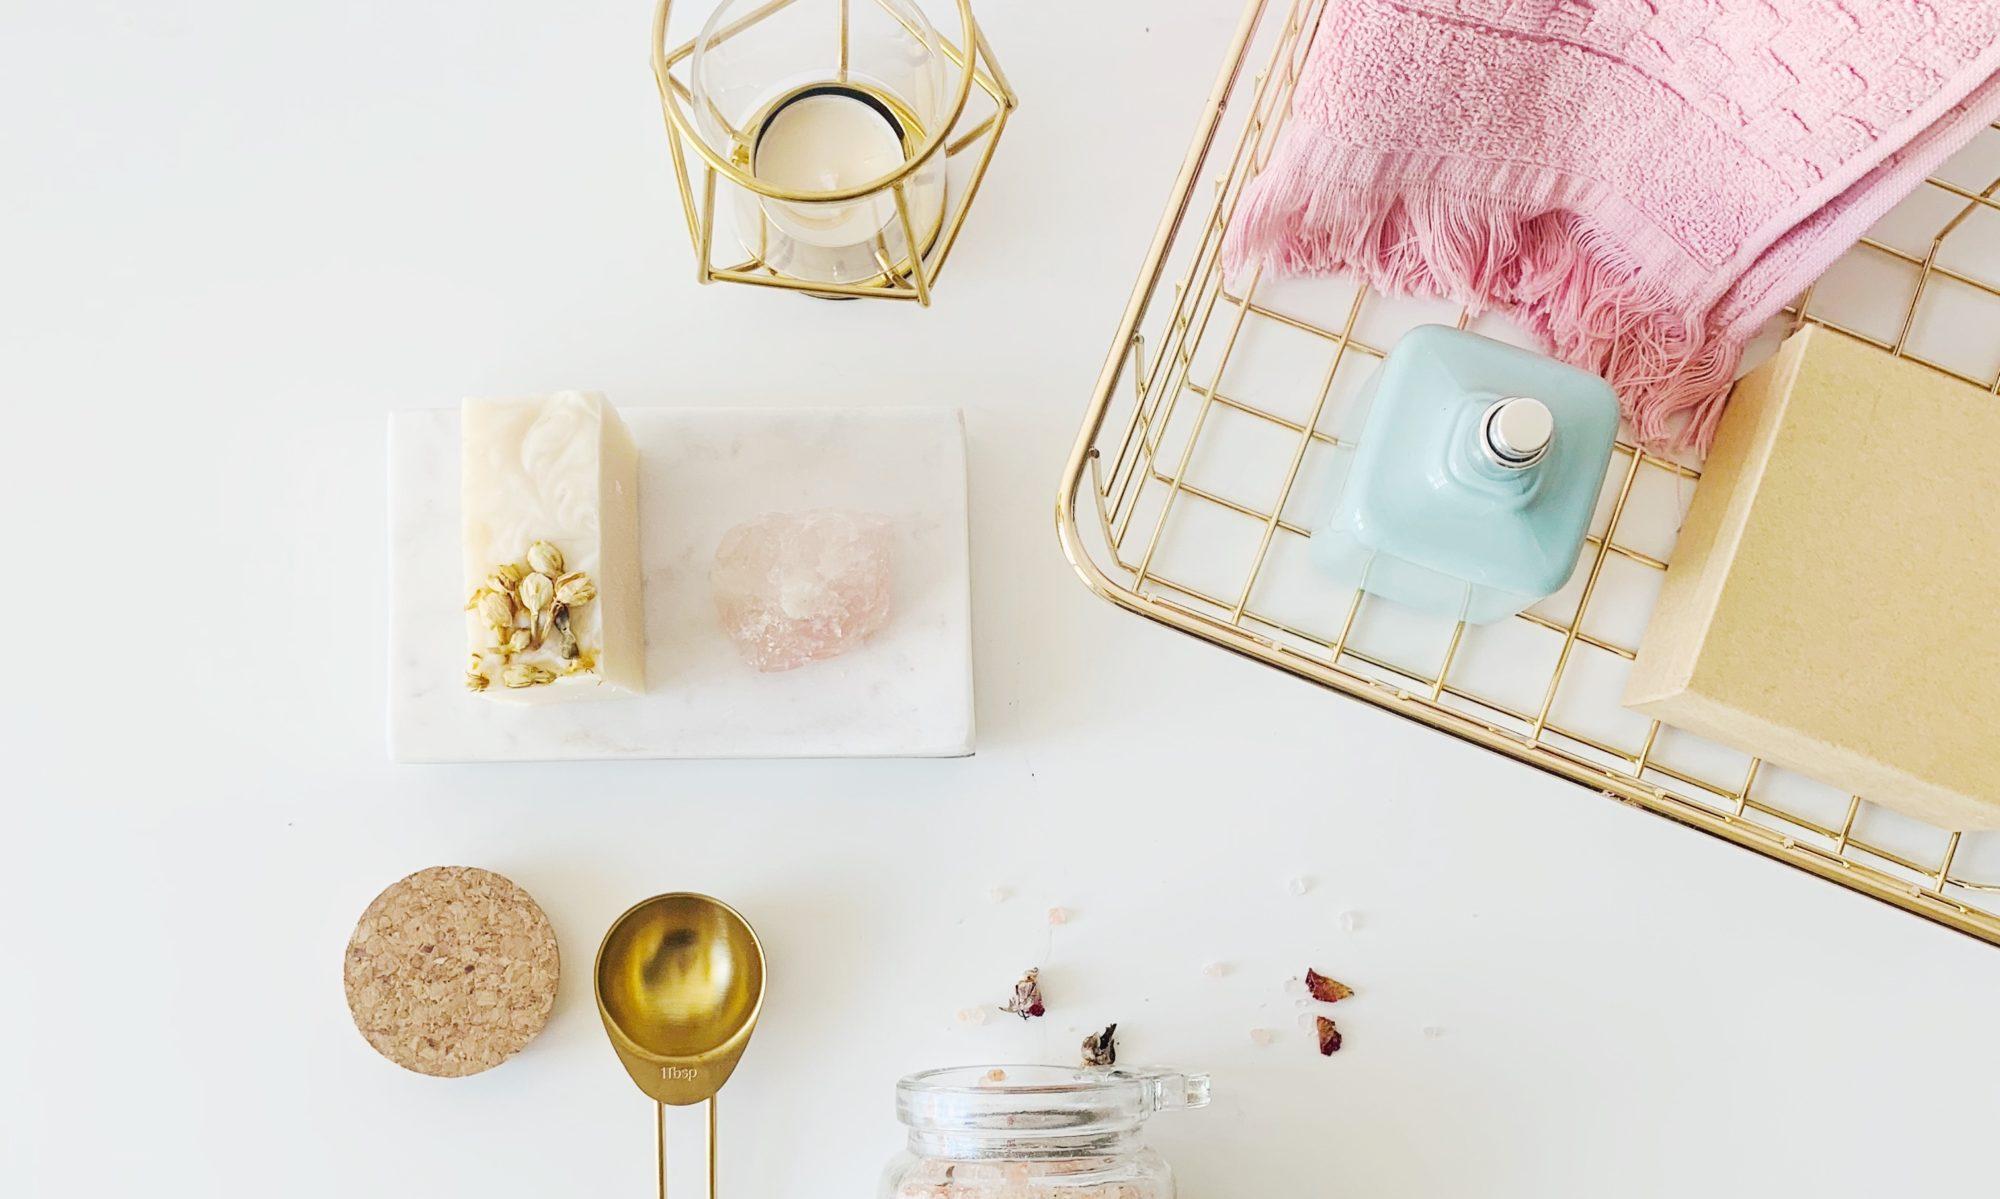 Organic cosmetics & domestics hands-on workshops